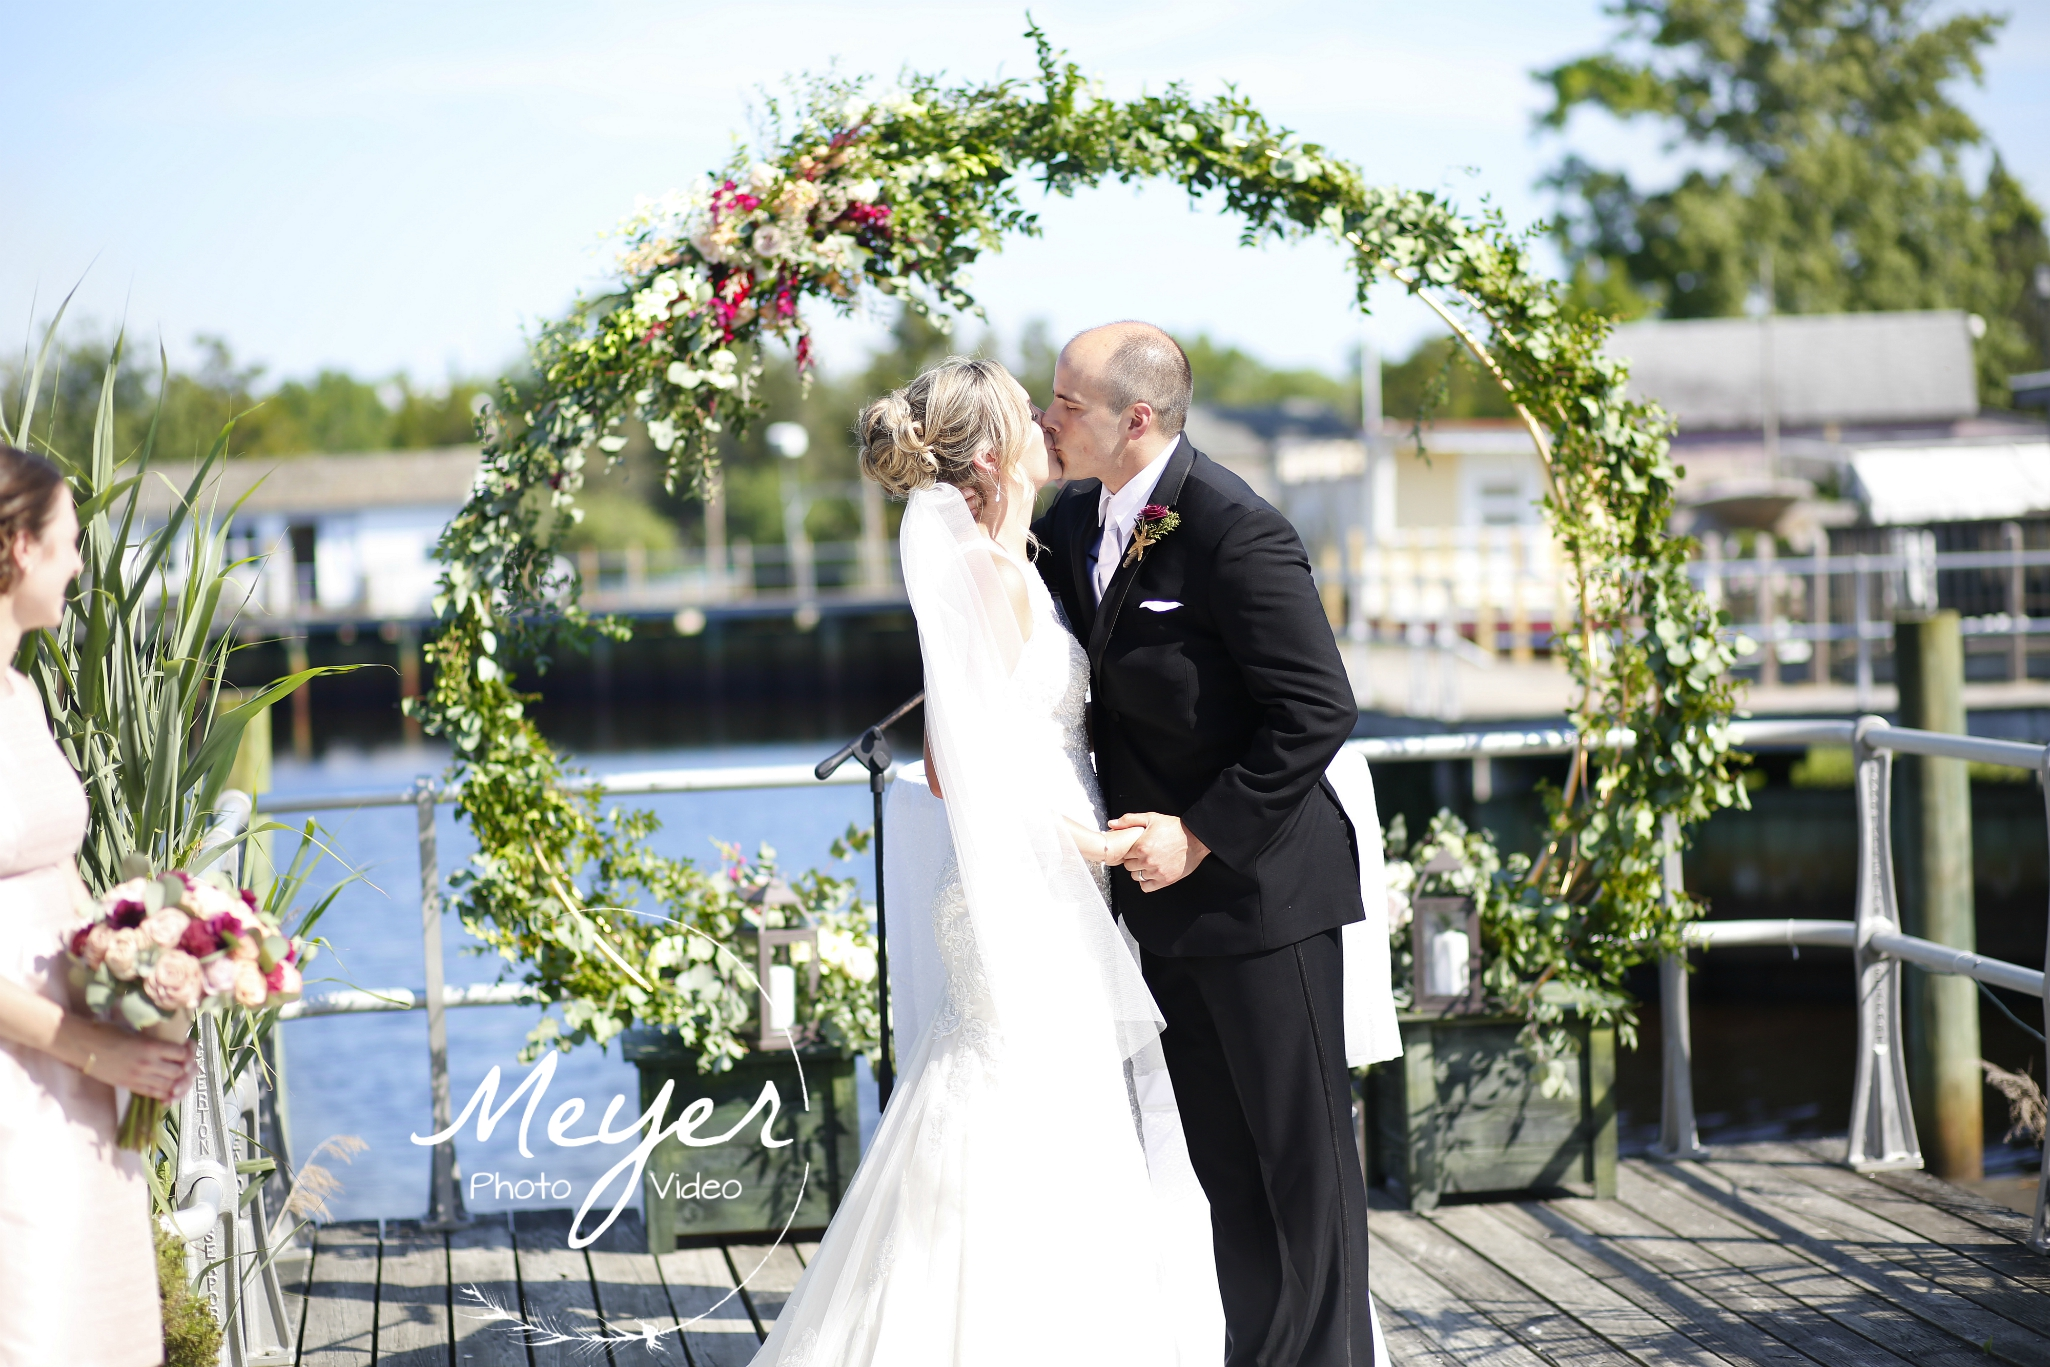 wedding kiss under arch tuckerton nj